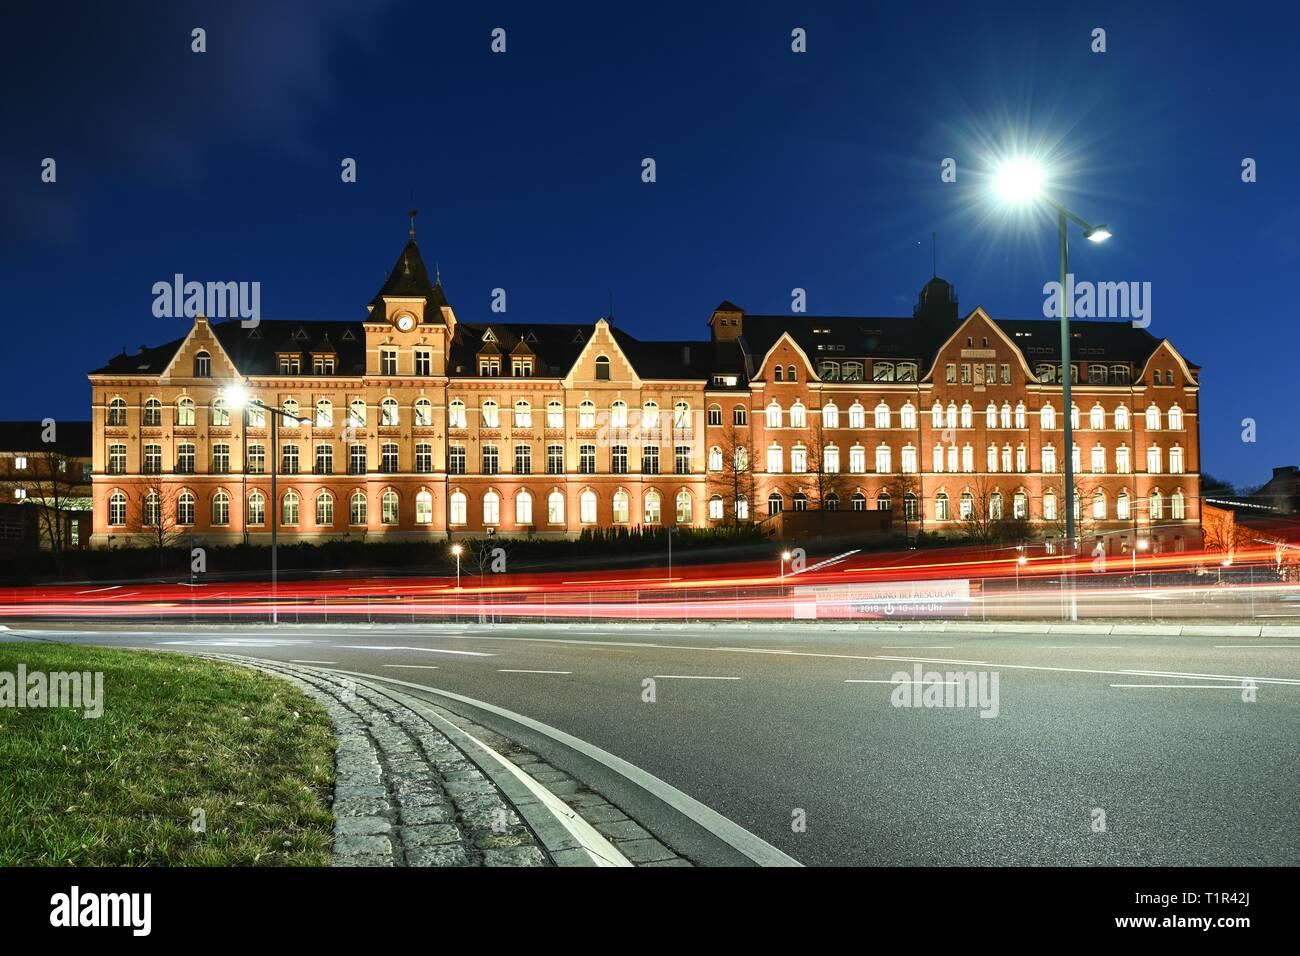 Tuttlingen, Germany  27th Mar, 2019  At Blue Hour, cars